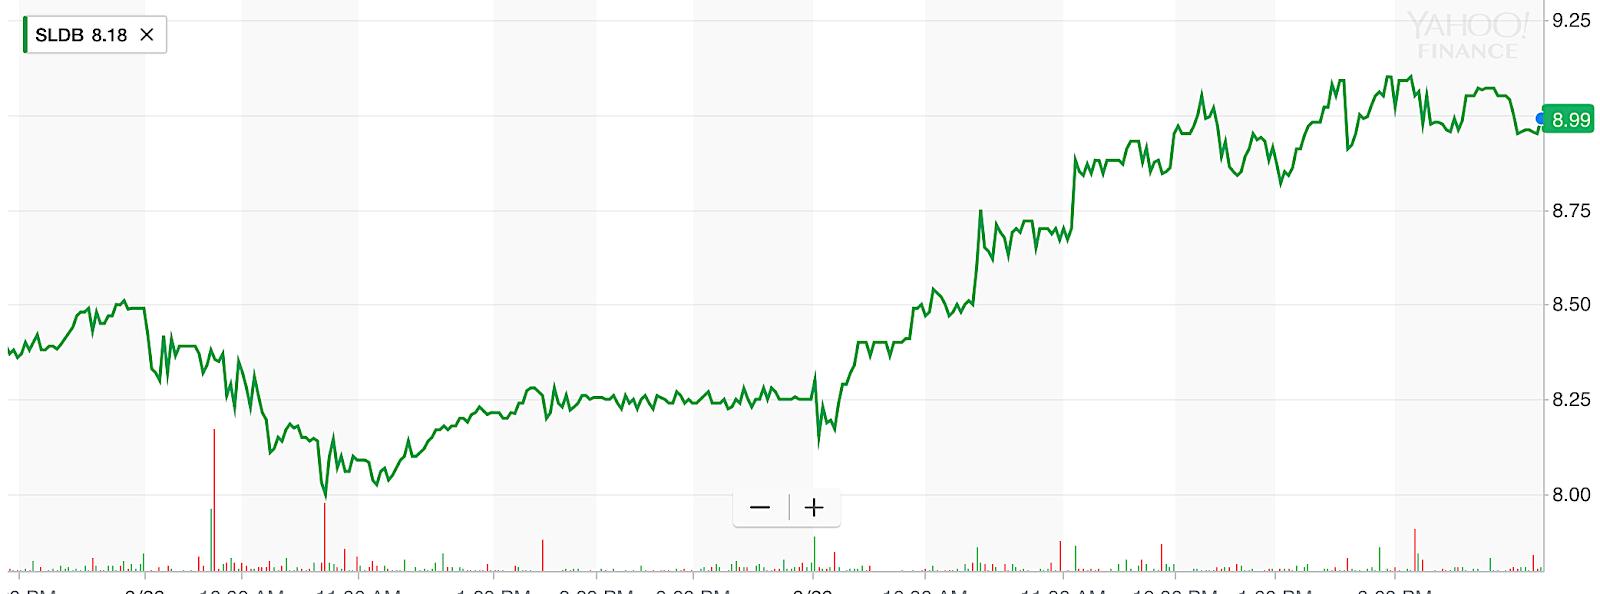 Ibb ishares nasdaq biotechnology index fund crowdsourced stock sauploadcwj djpr0meqpbcpingzsd b9l4excknfgrxgkbolahtcatlkkbym2ryjbwont06buahunab1n9uhzwexqp1k3ryjq9c2mqqab9eyerv5ovy3ht6qucterrjea5qasstdwtnkthumb1g biocorpaavc Images